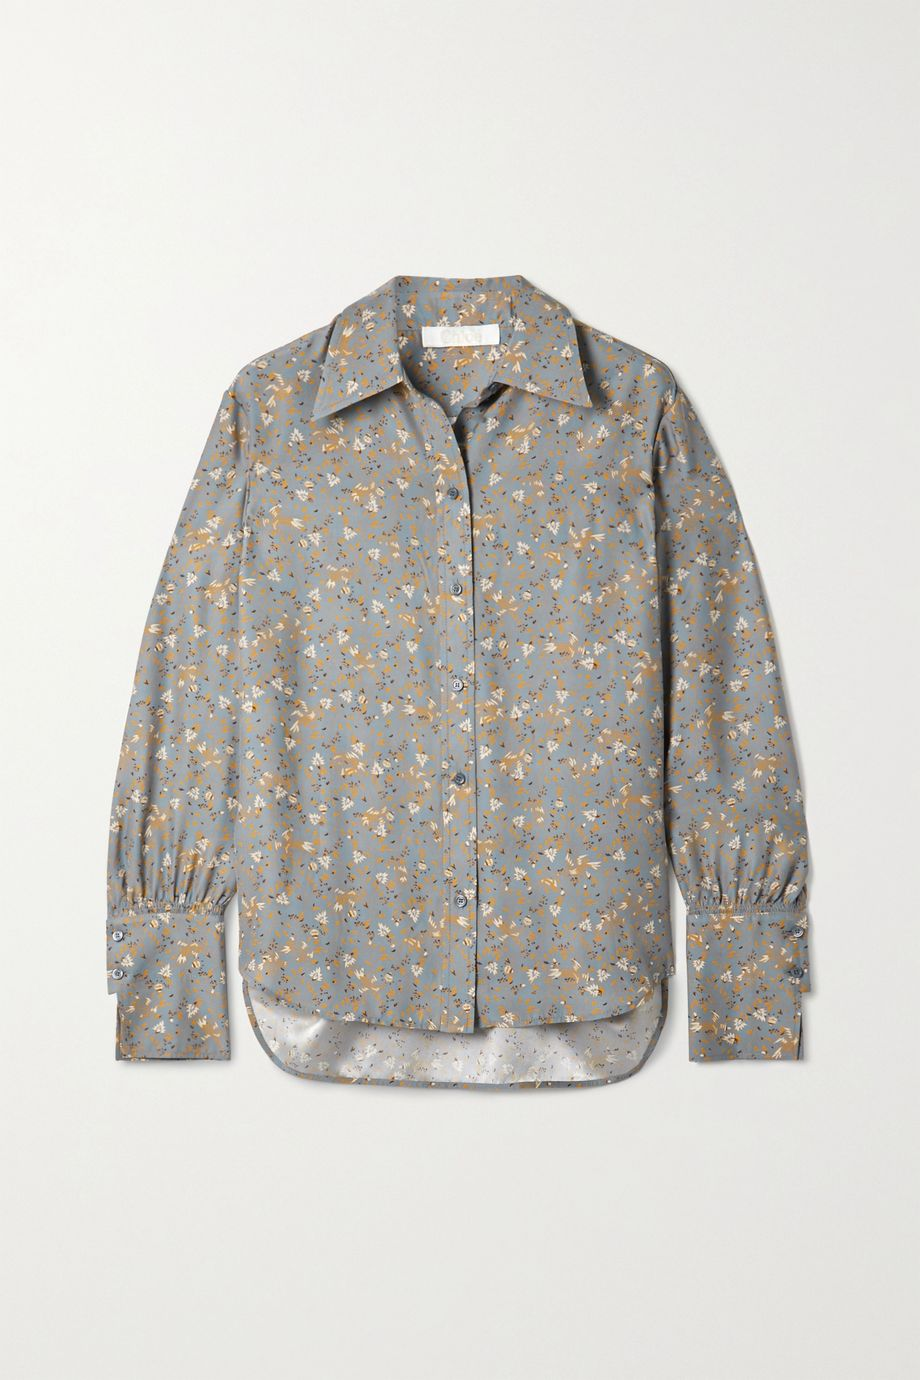 Chloé 花卉印花真丝双绉衬衫